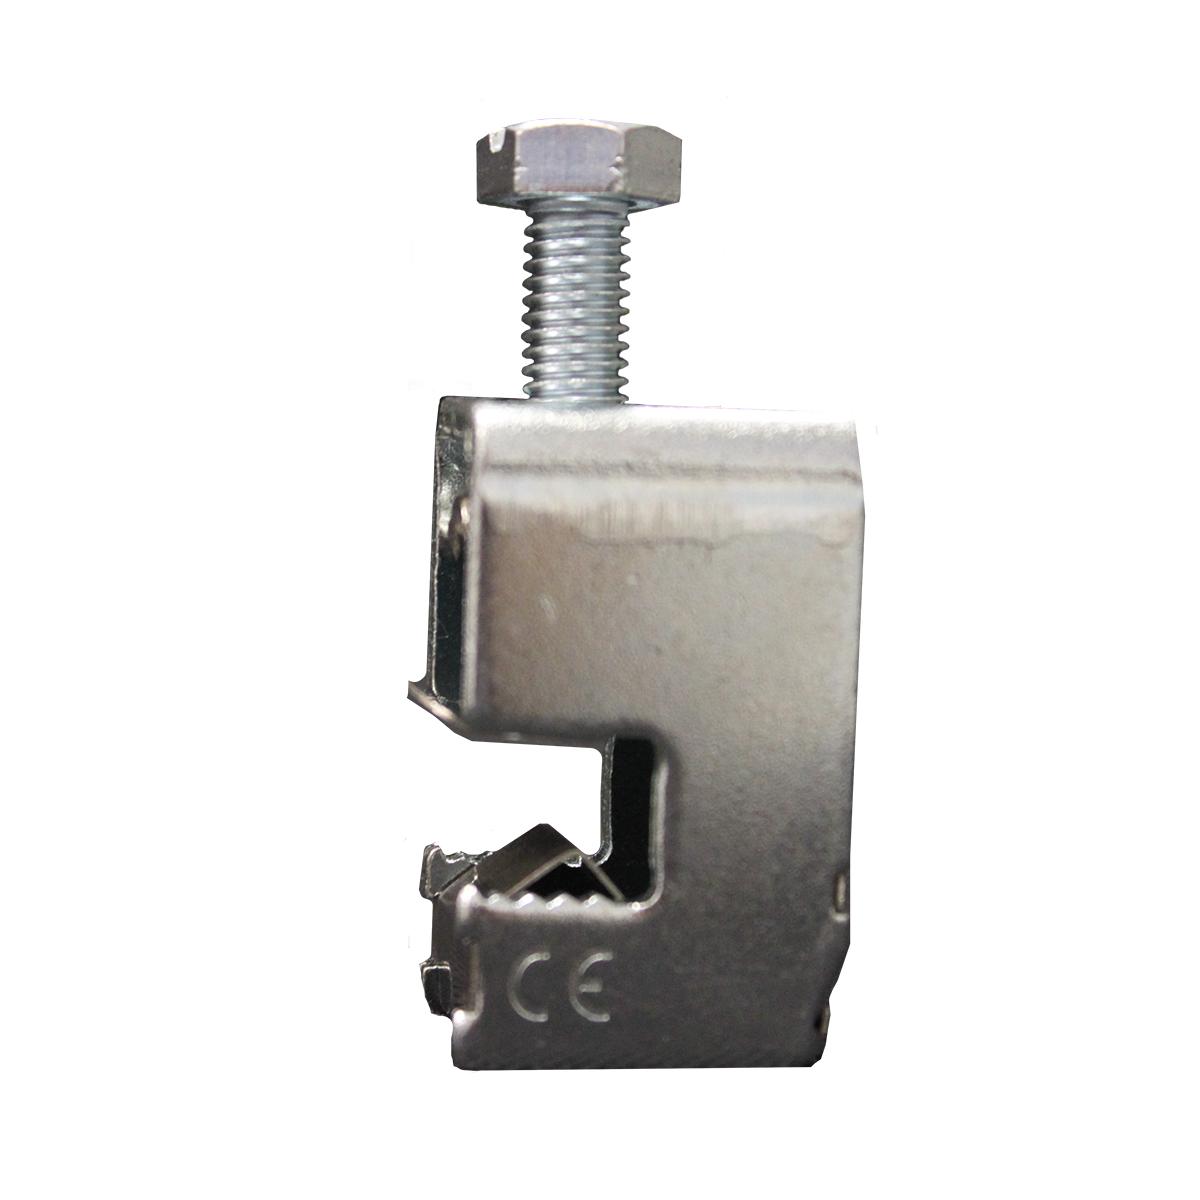 1 Stk Alu-Kupfer-Leiteranschlußklemme 16 -70mm² / 10mm IS5057010-